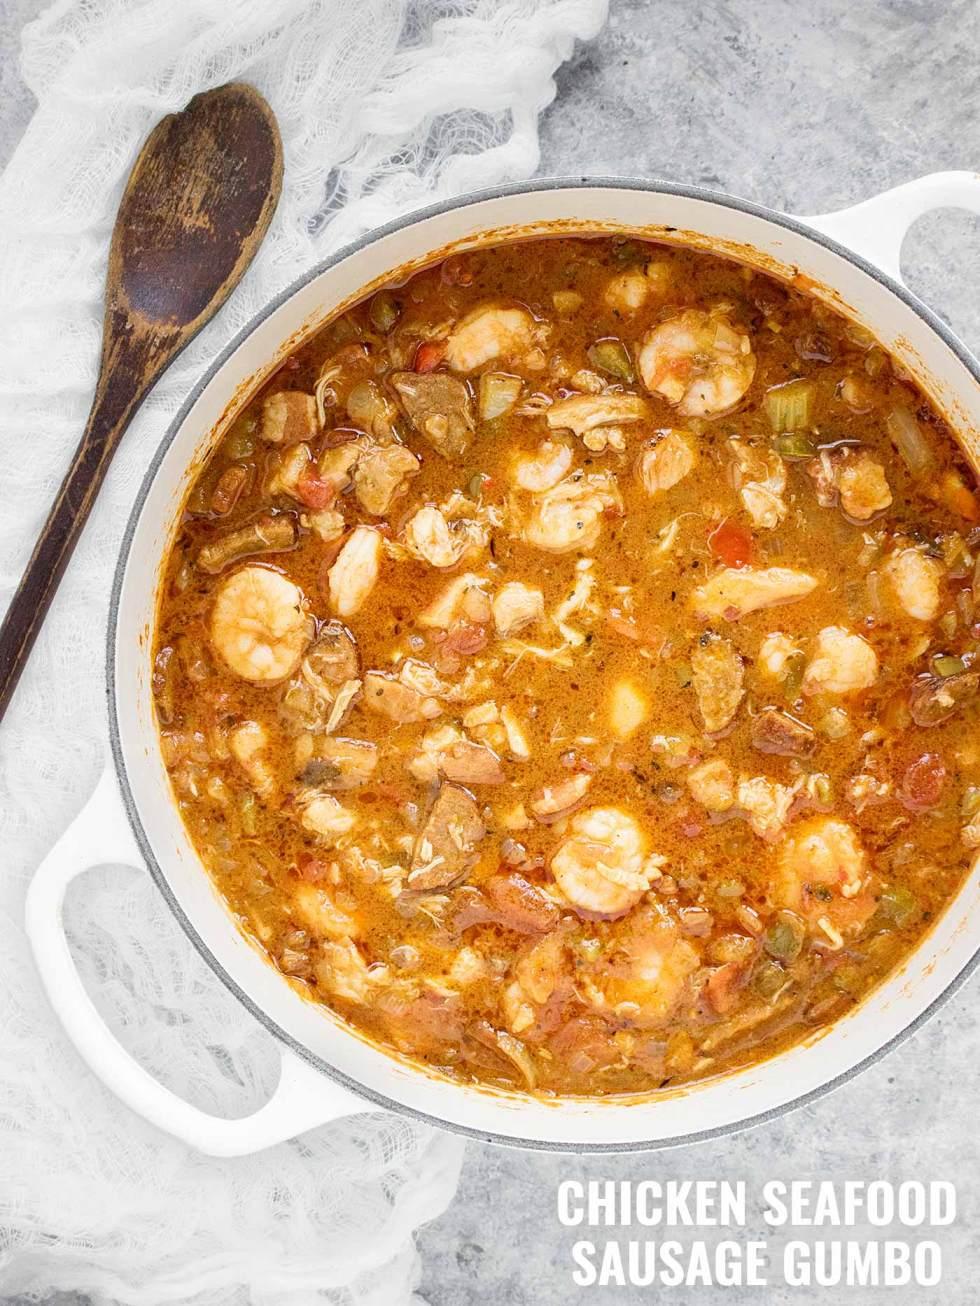 Chicken Seafood Sausage Gumbo - Recipe at SoupAddict.com